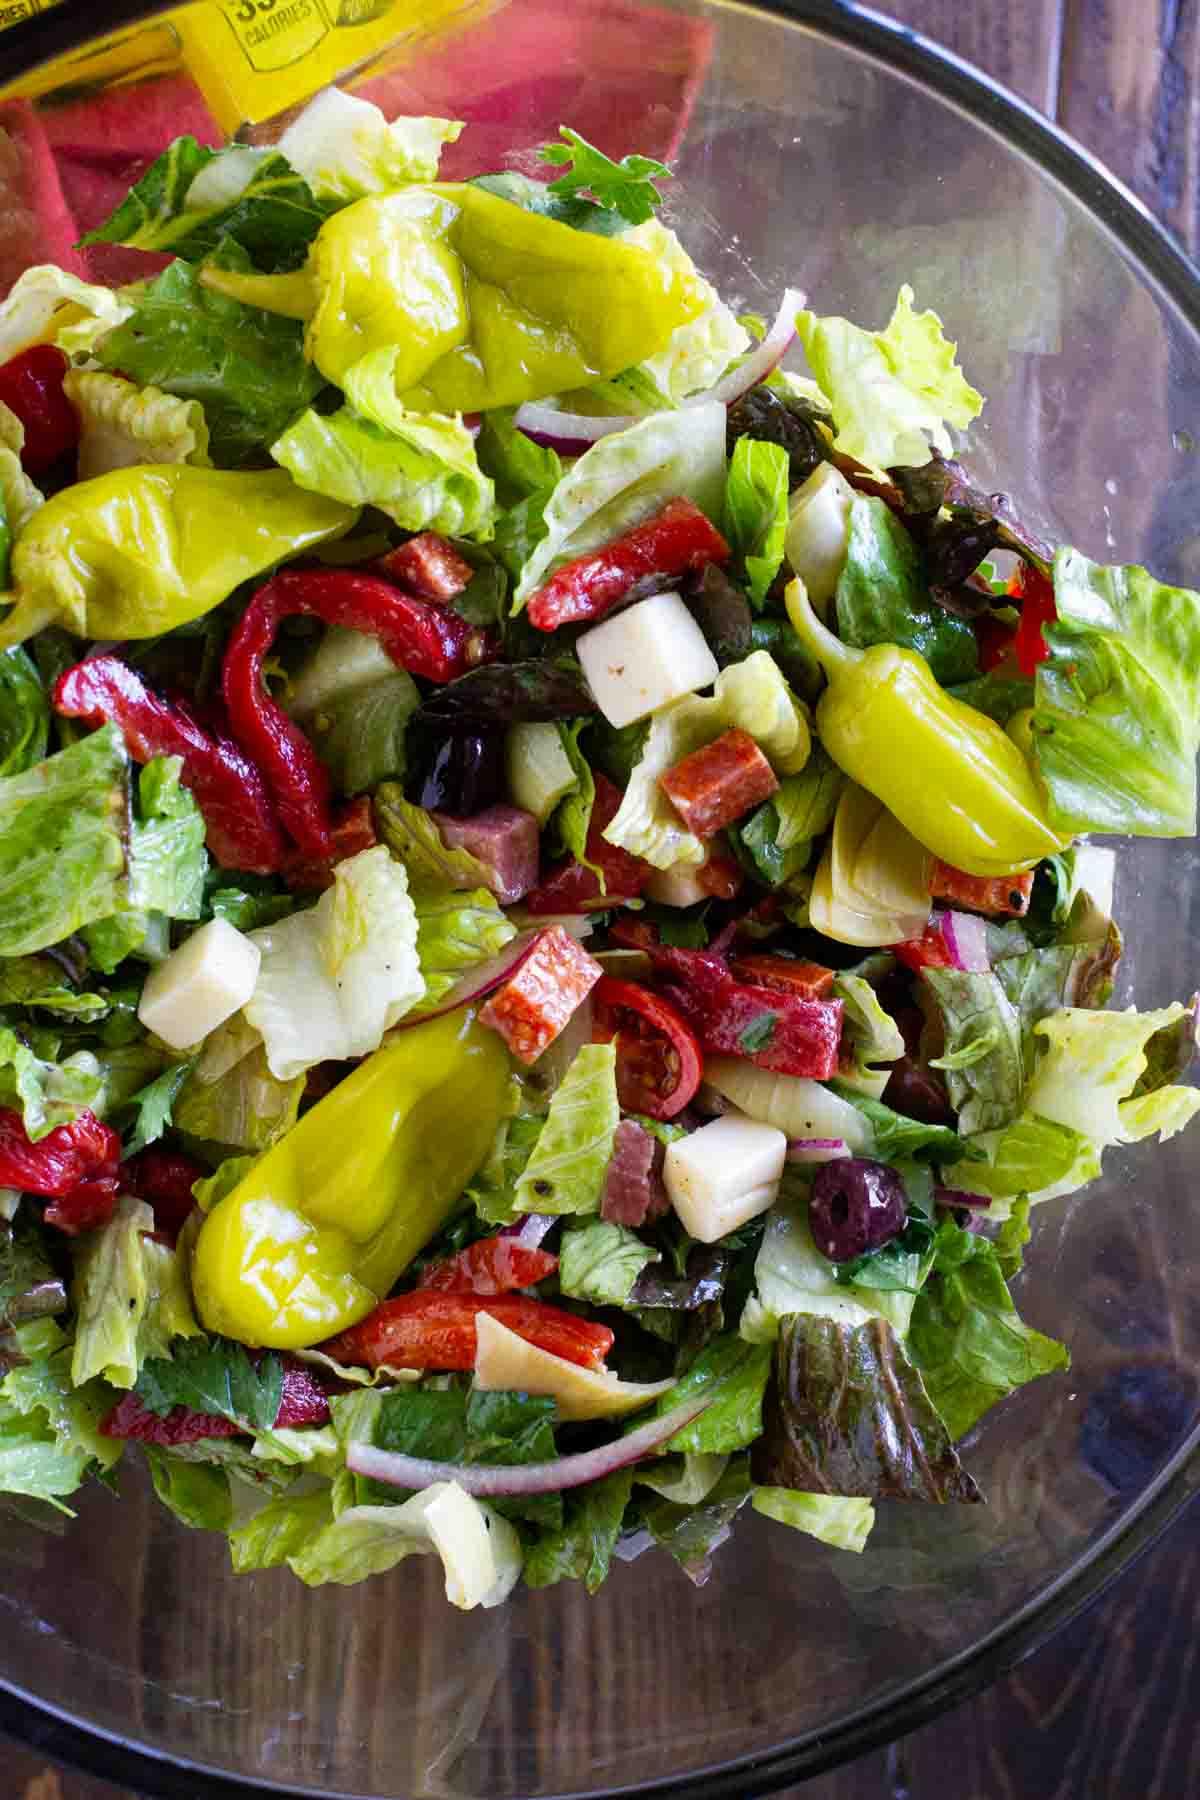 How to Make Antipasto Salad